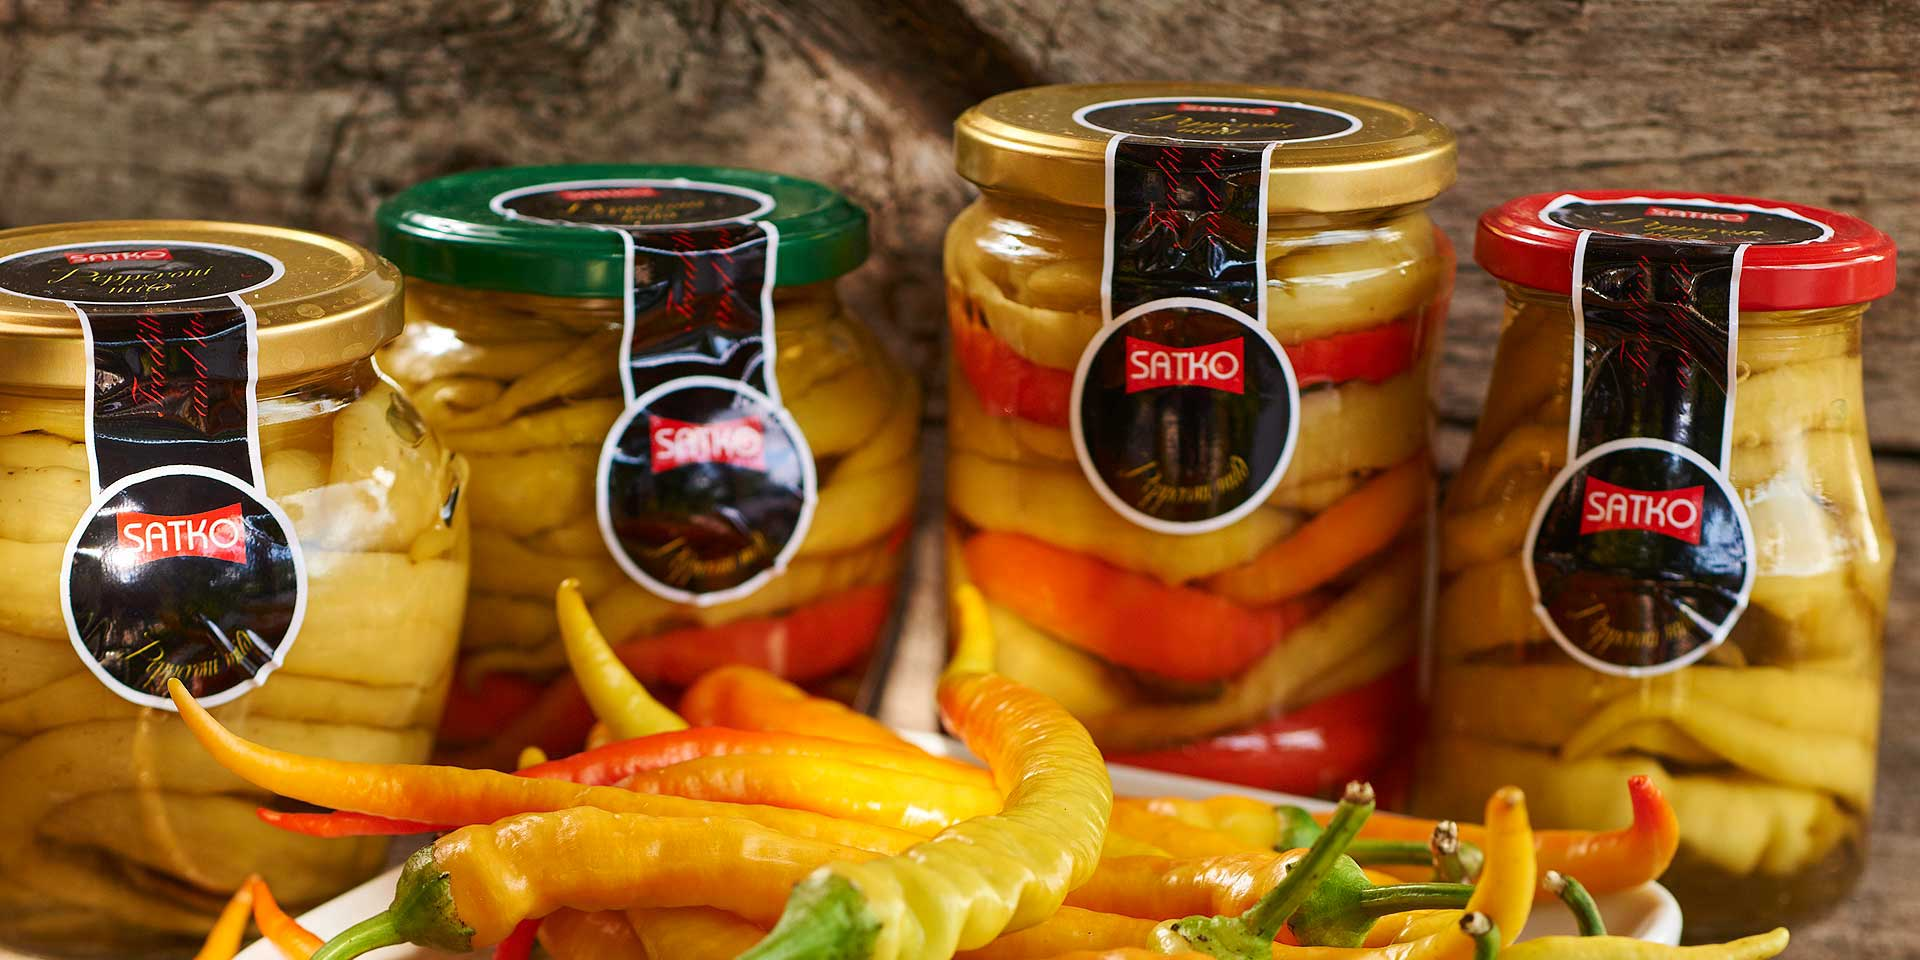 SATKO - Canning factory